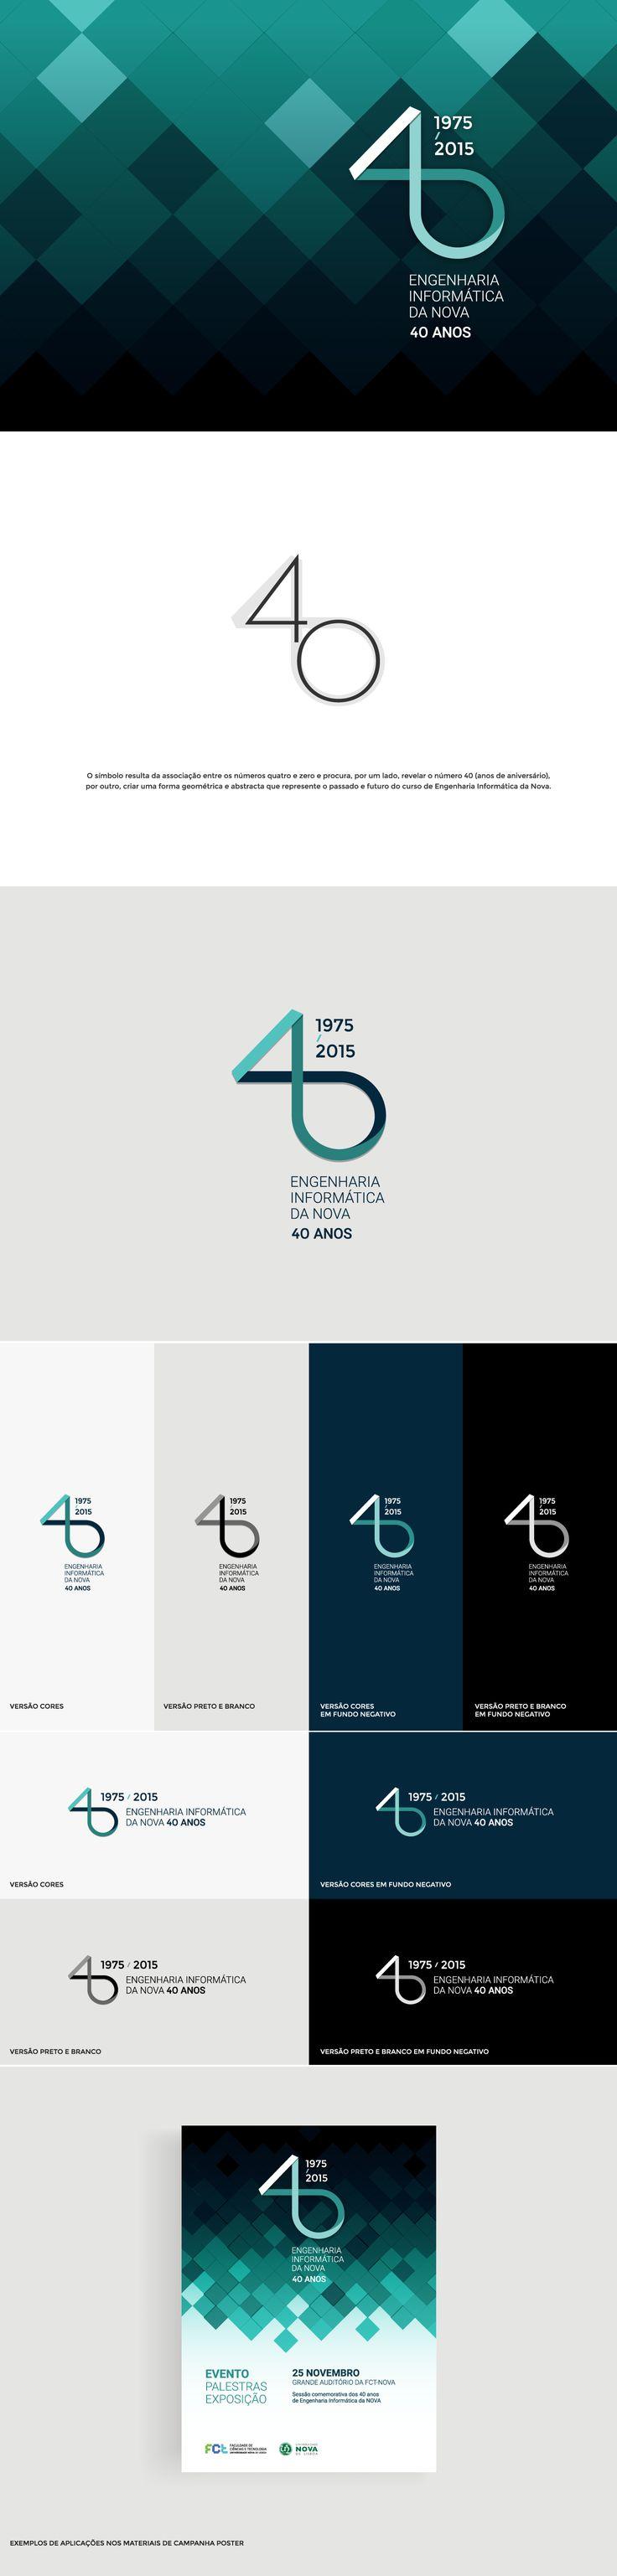 Computer Science at Nova, 40th Anniversary Logo on Behance http://jrstudioweb.com/diseno-grafico/diseno-de-logotipos/